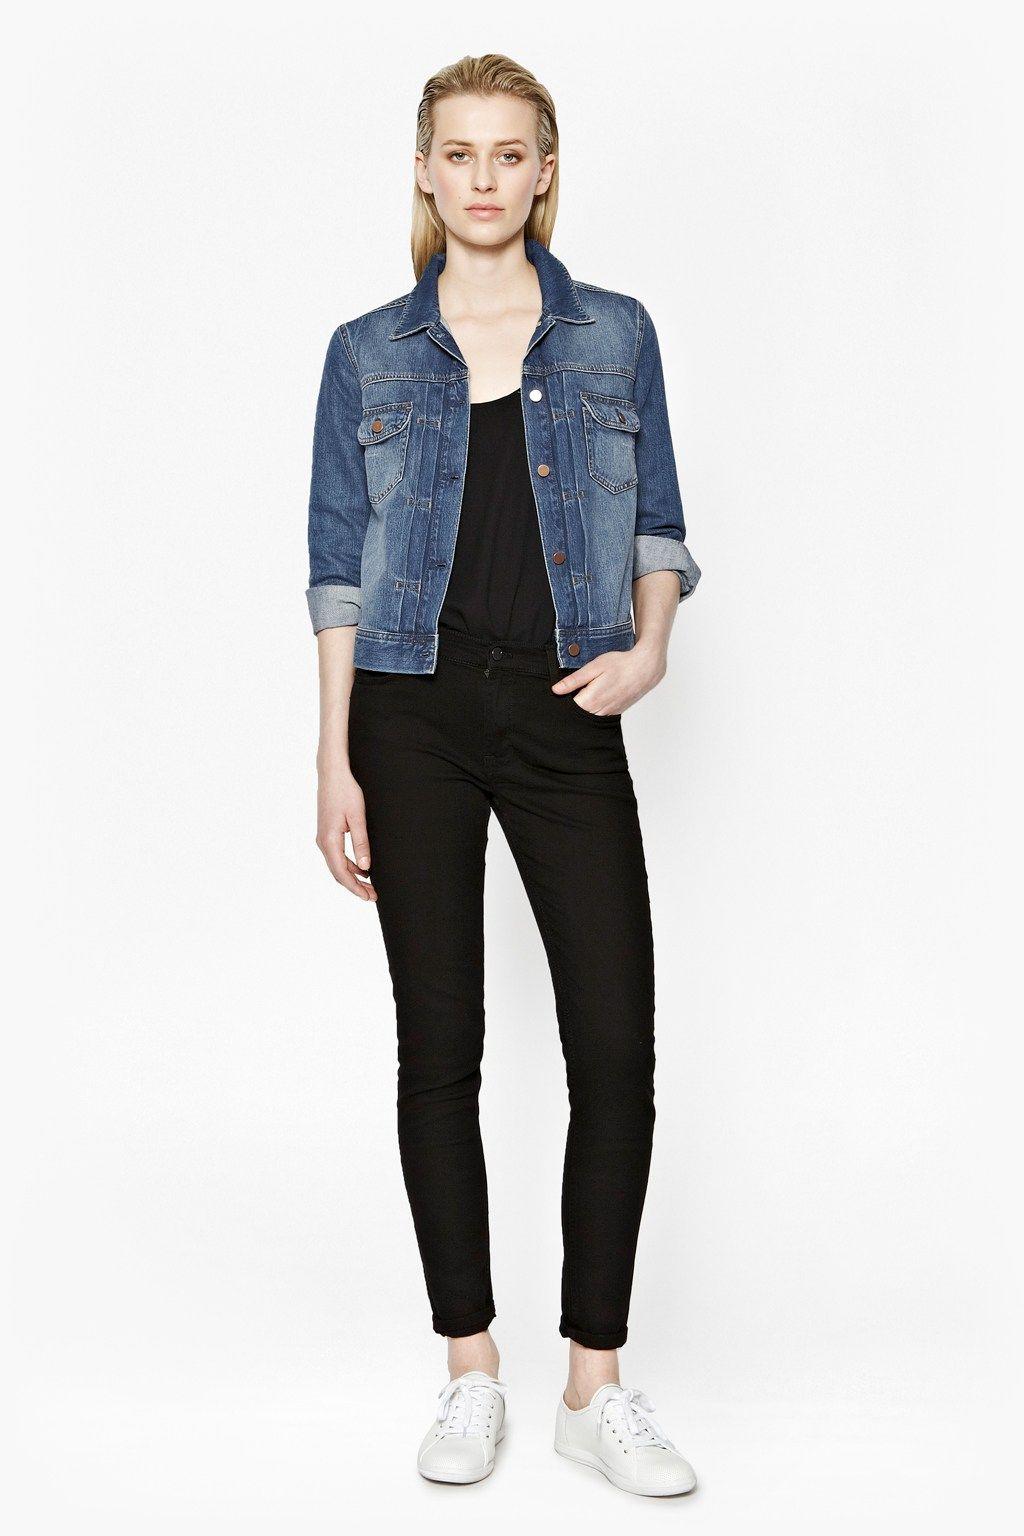 Womens denim jacket buy online india – New Fashion Photo Blog